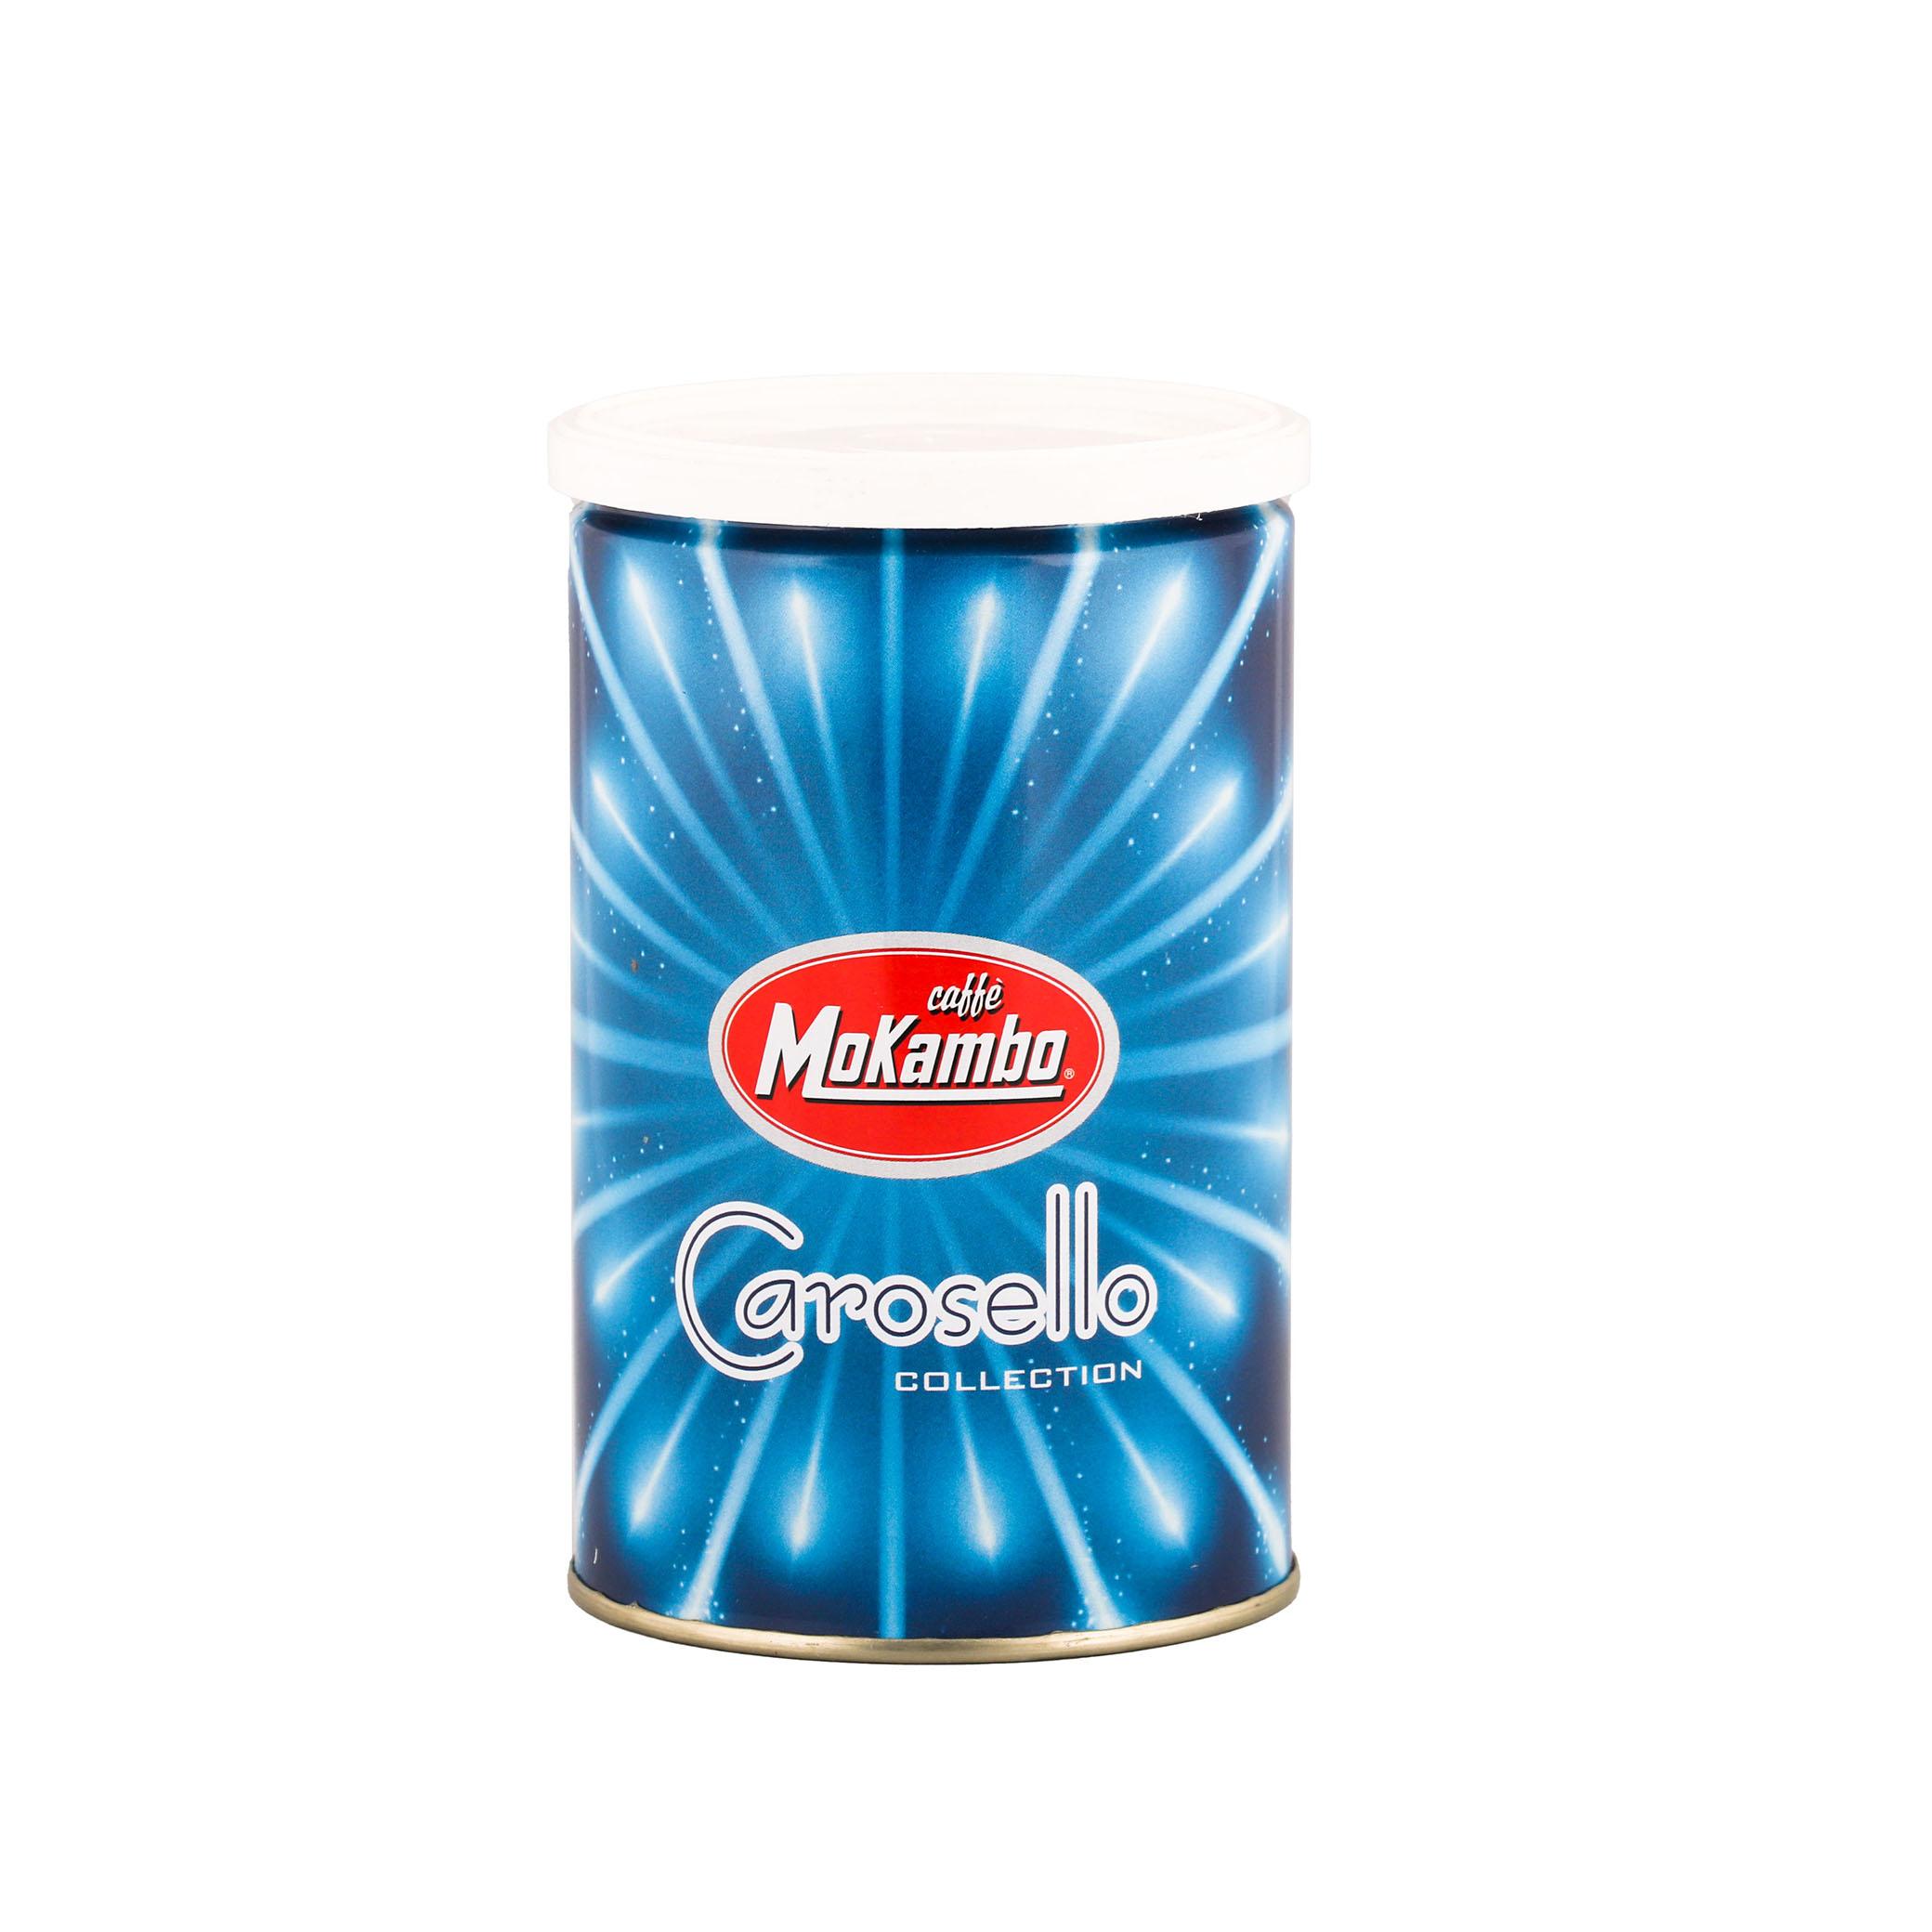 پودر قهوه اسپرسو کارسلو موکامبو - 250 گرم